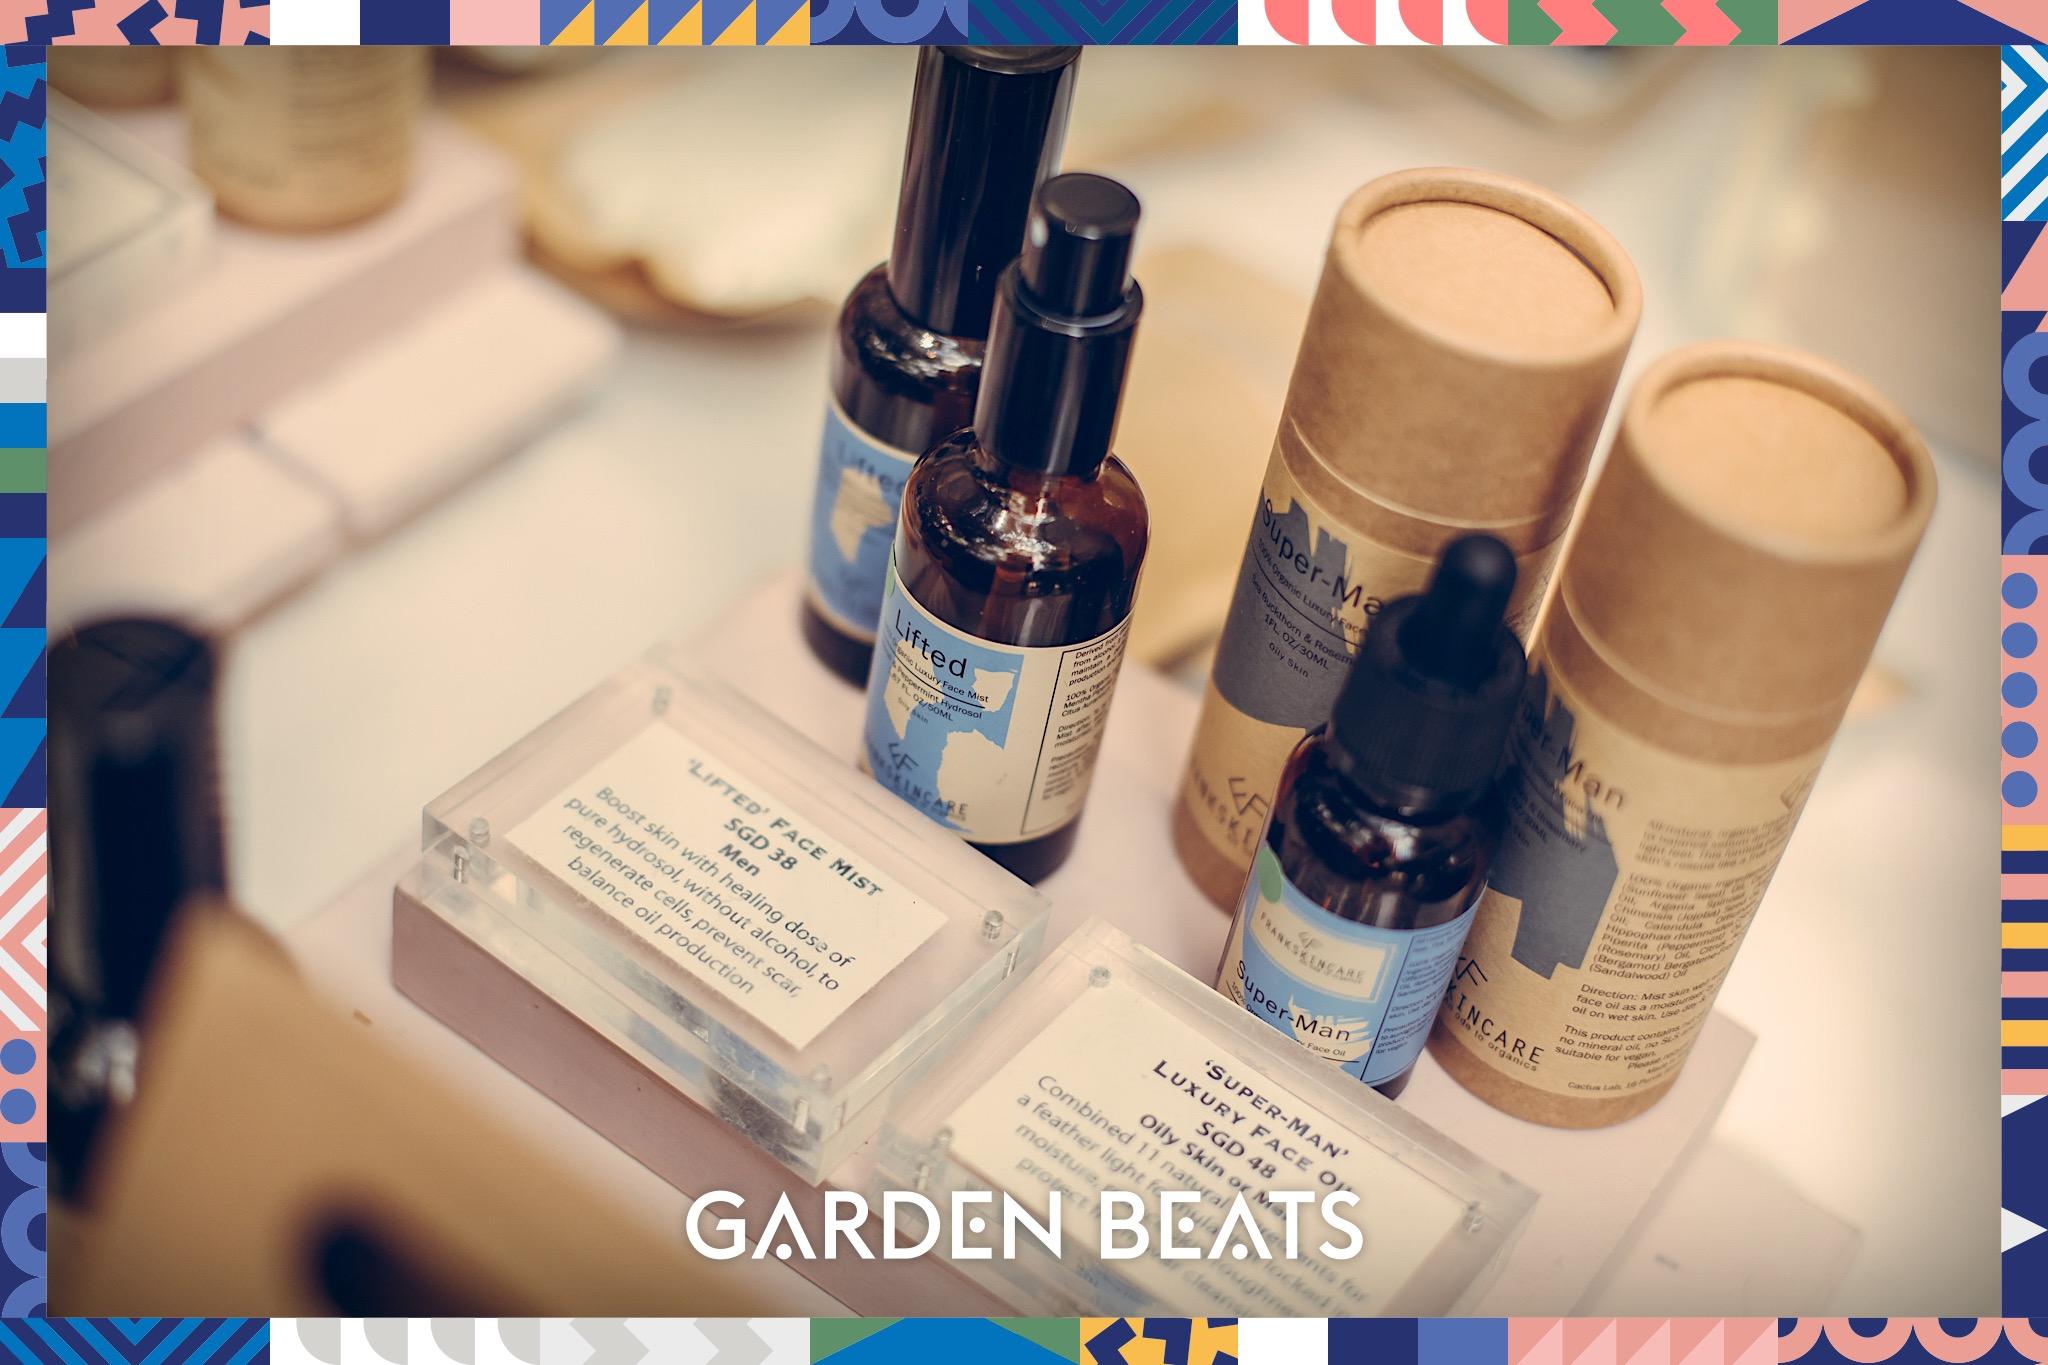 03032018_GardenBeats_Colossal128_Watermarked.jpg